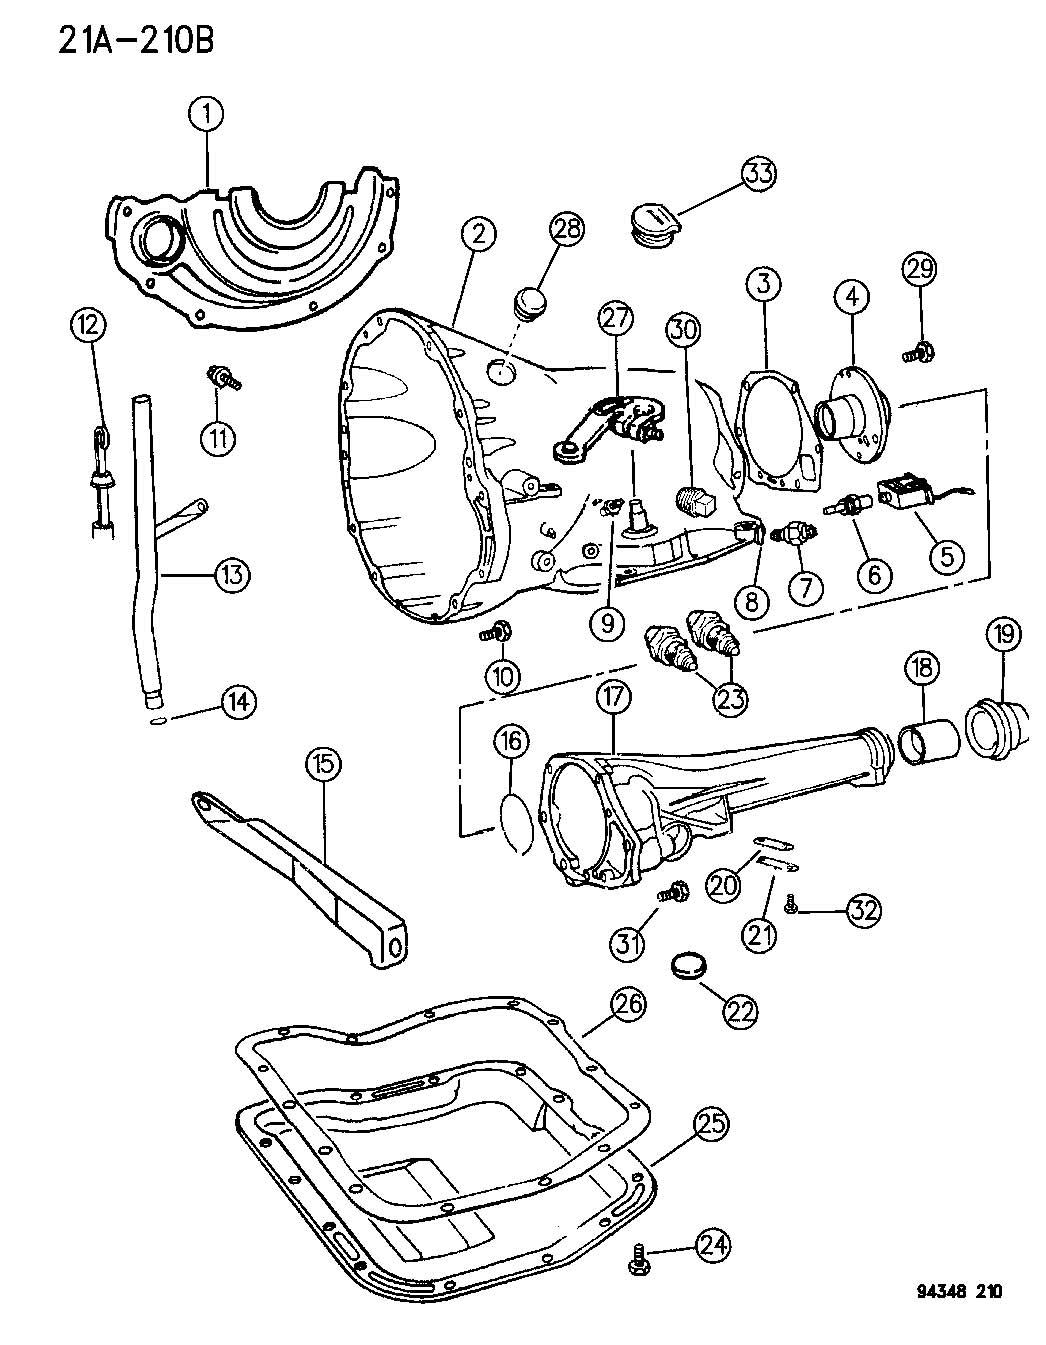 1994 Dodge Van/Wagon - Full Size Solenoid assembly ...